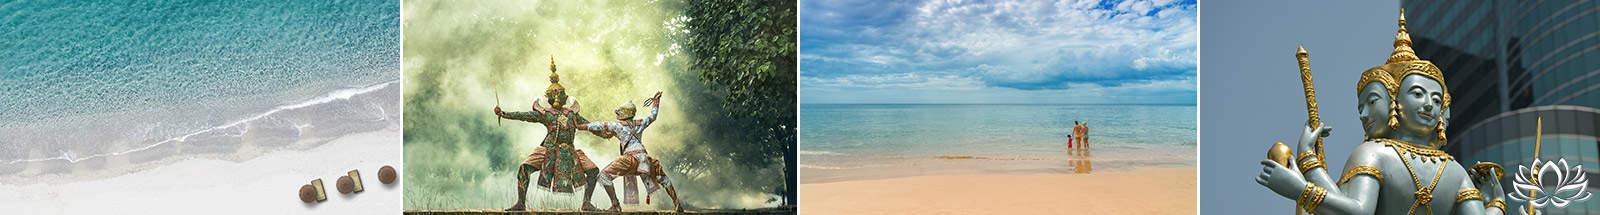 visa Thaïlande, vivre en Thaïlande, expat, expatsiam, siamexpat